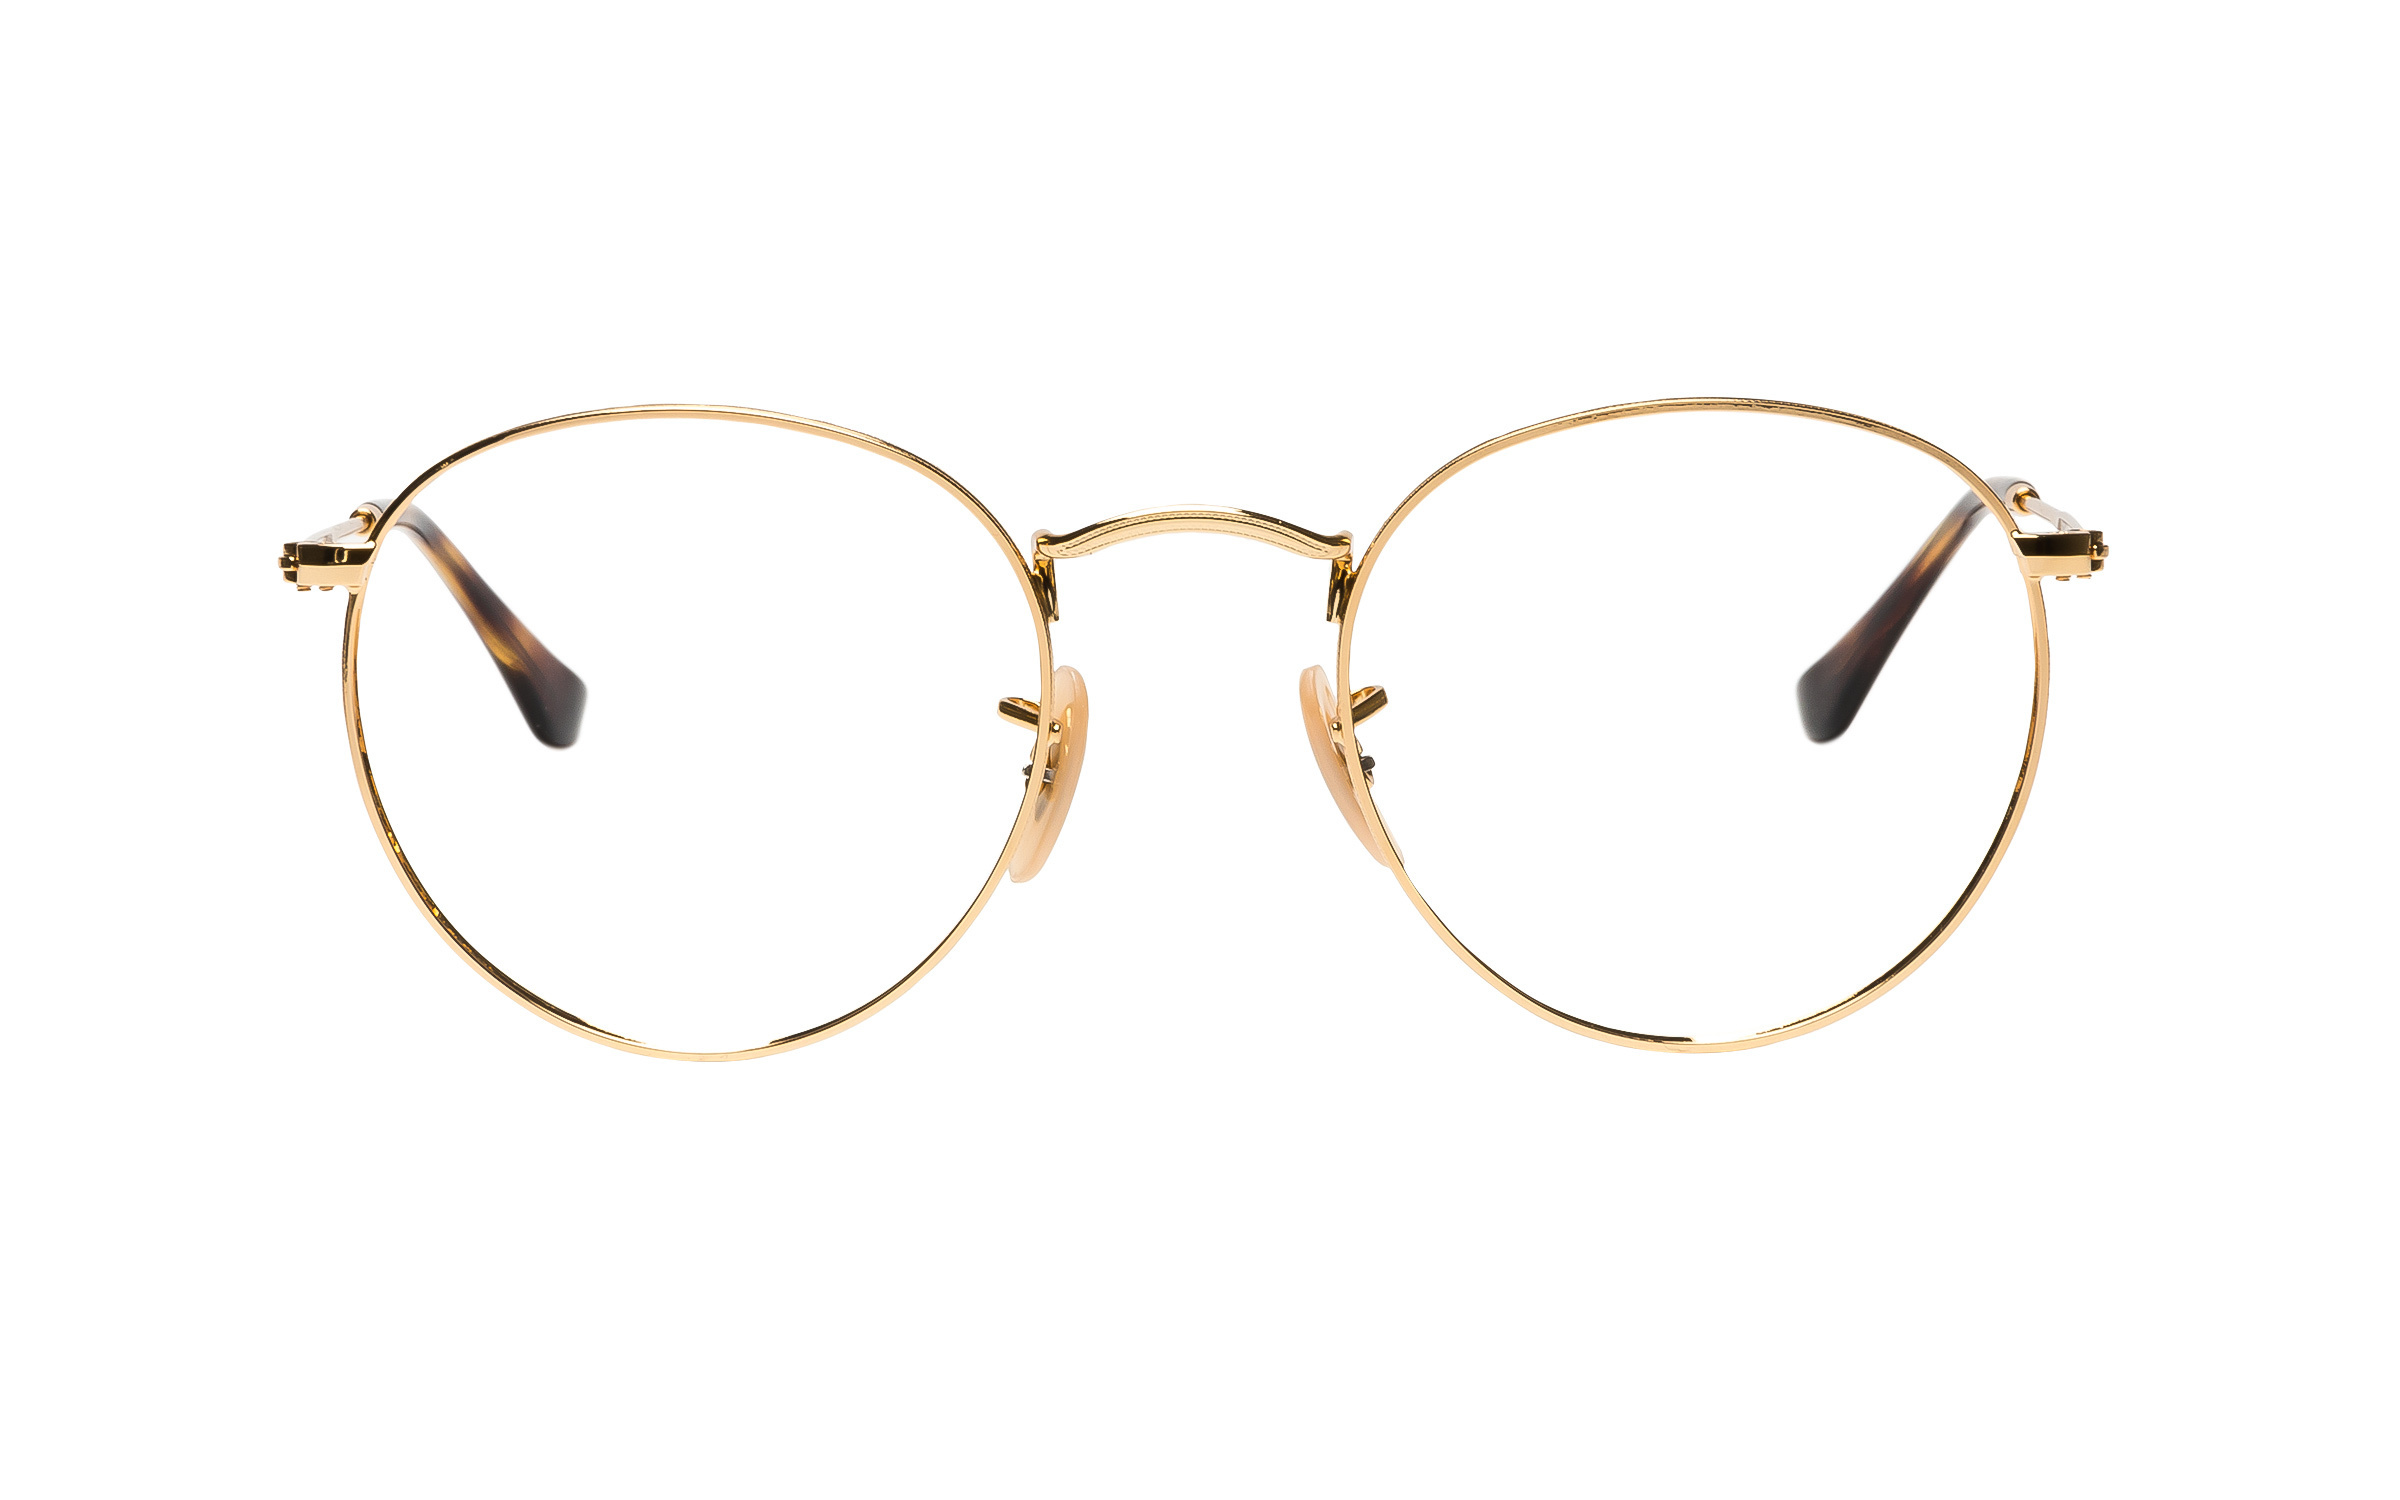 Ray-Ban RX3447V 2500 50 Eyeglasses and Frame in Gold | Acetate/Metal - Online Coastal